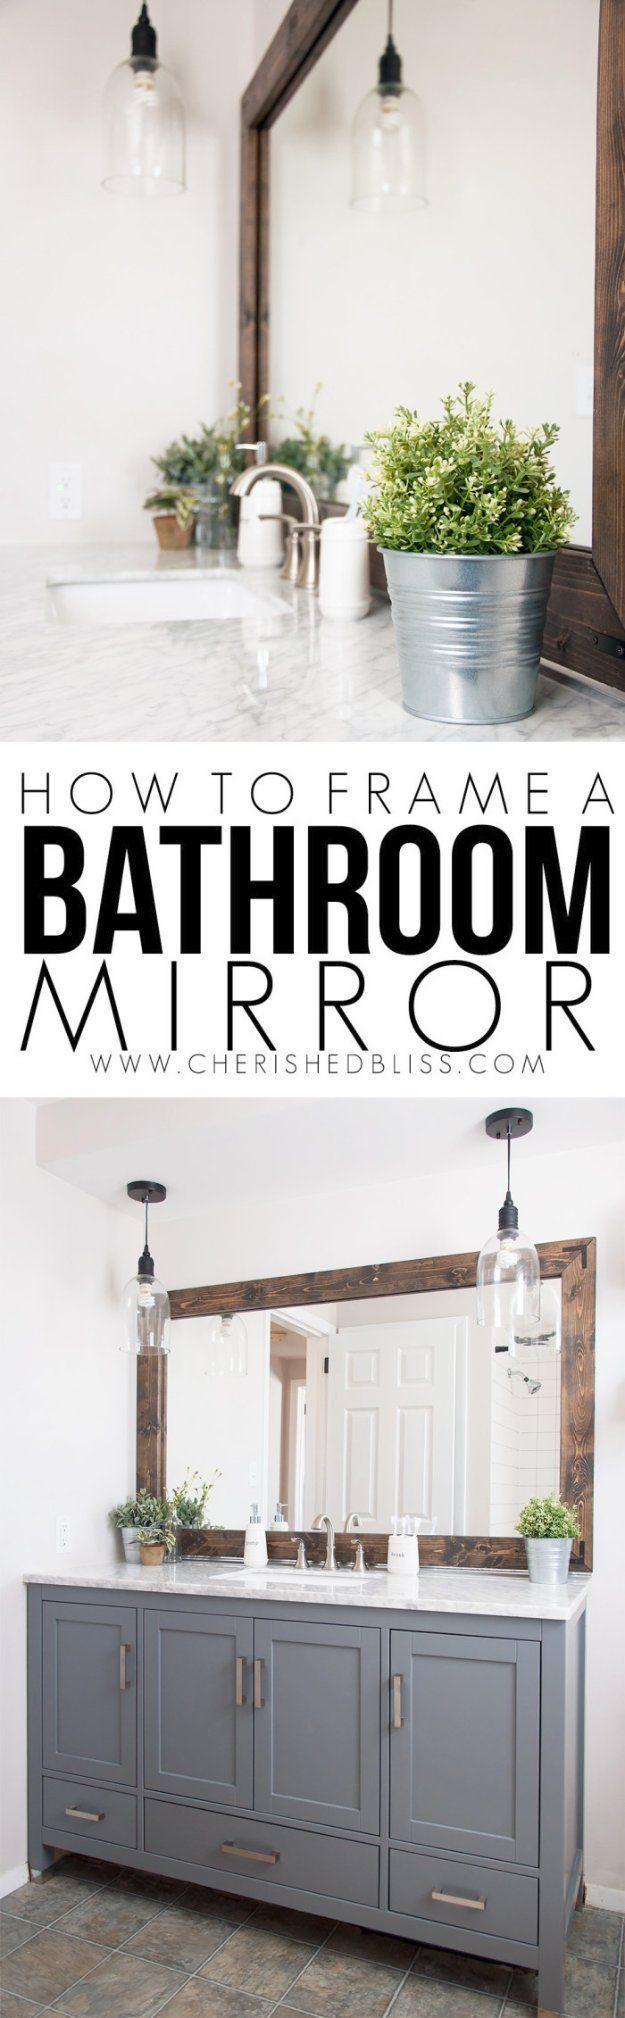 146 best Bathroom Designs Ideas images on Pinterest   Top blogs, Diy ...